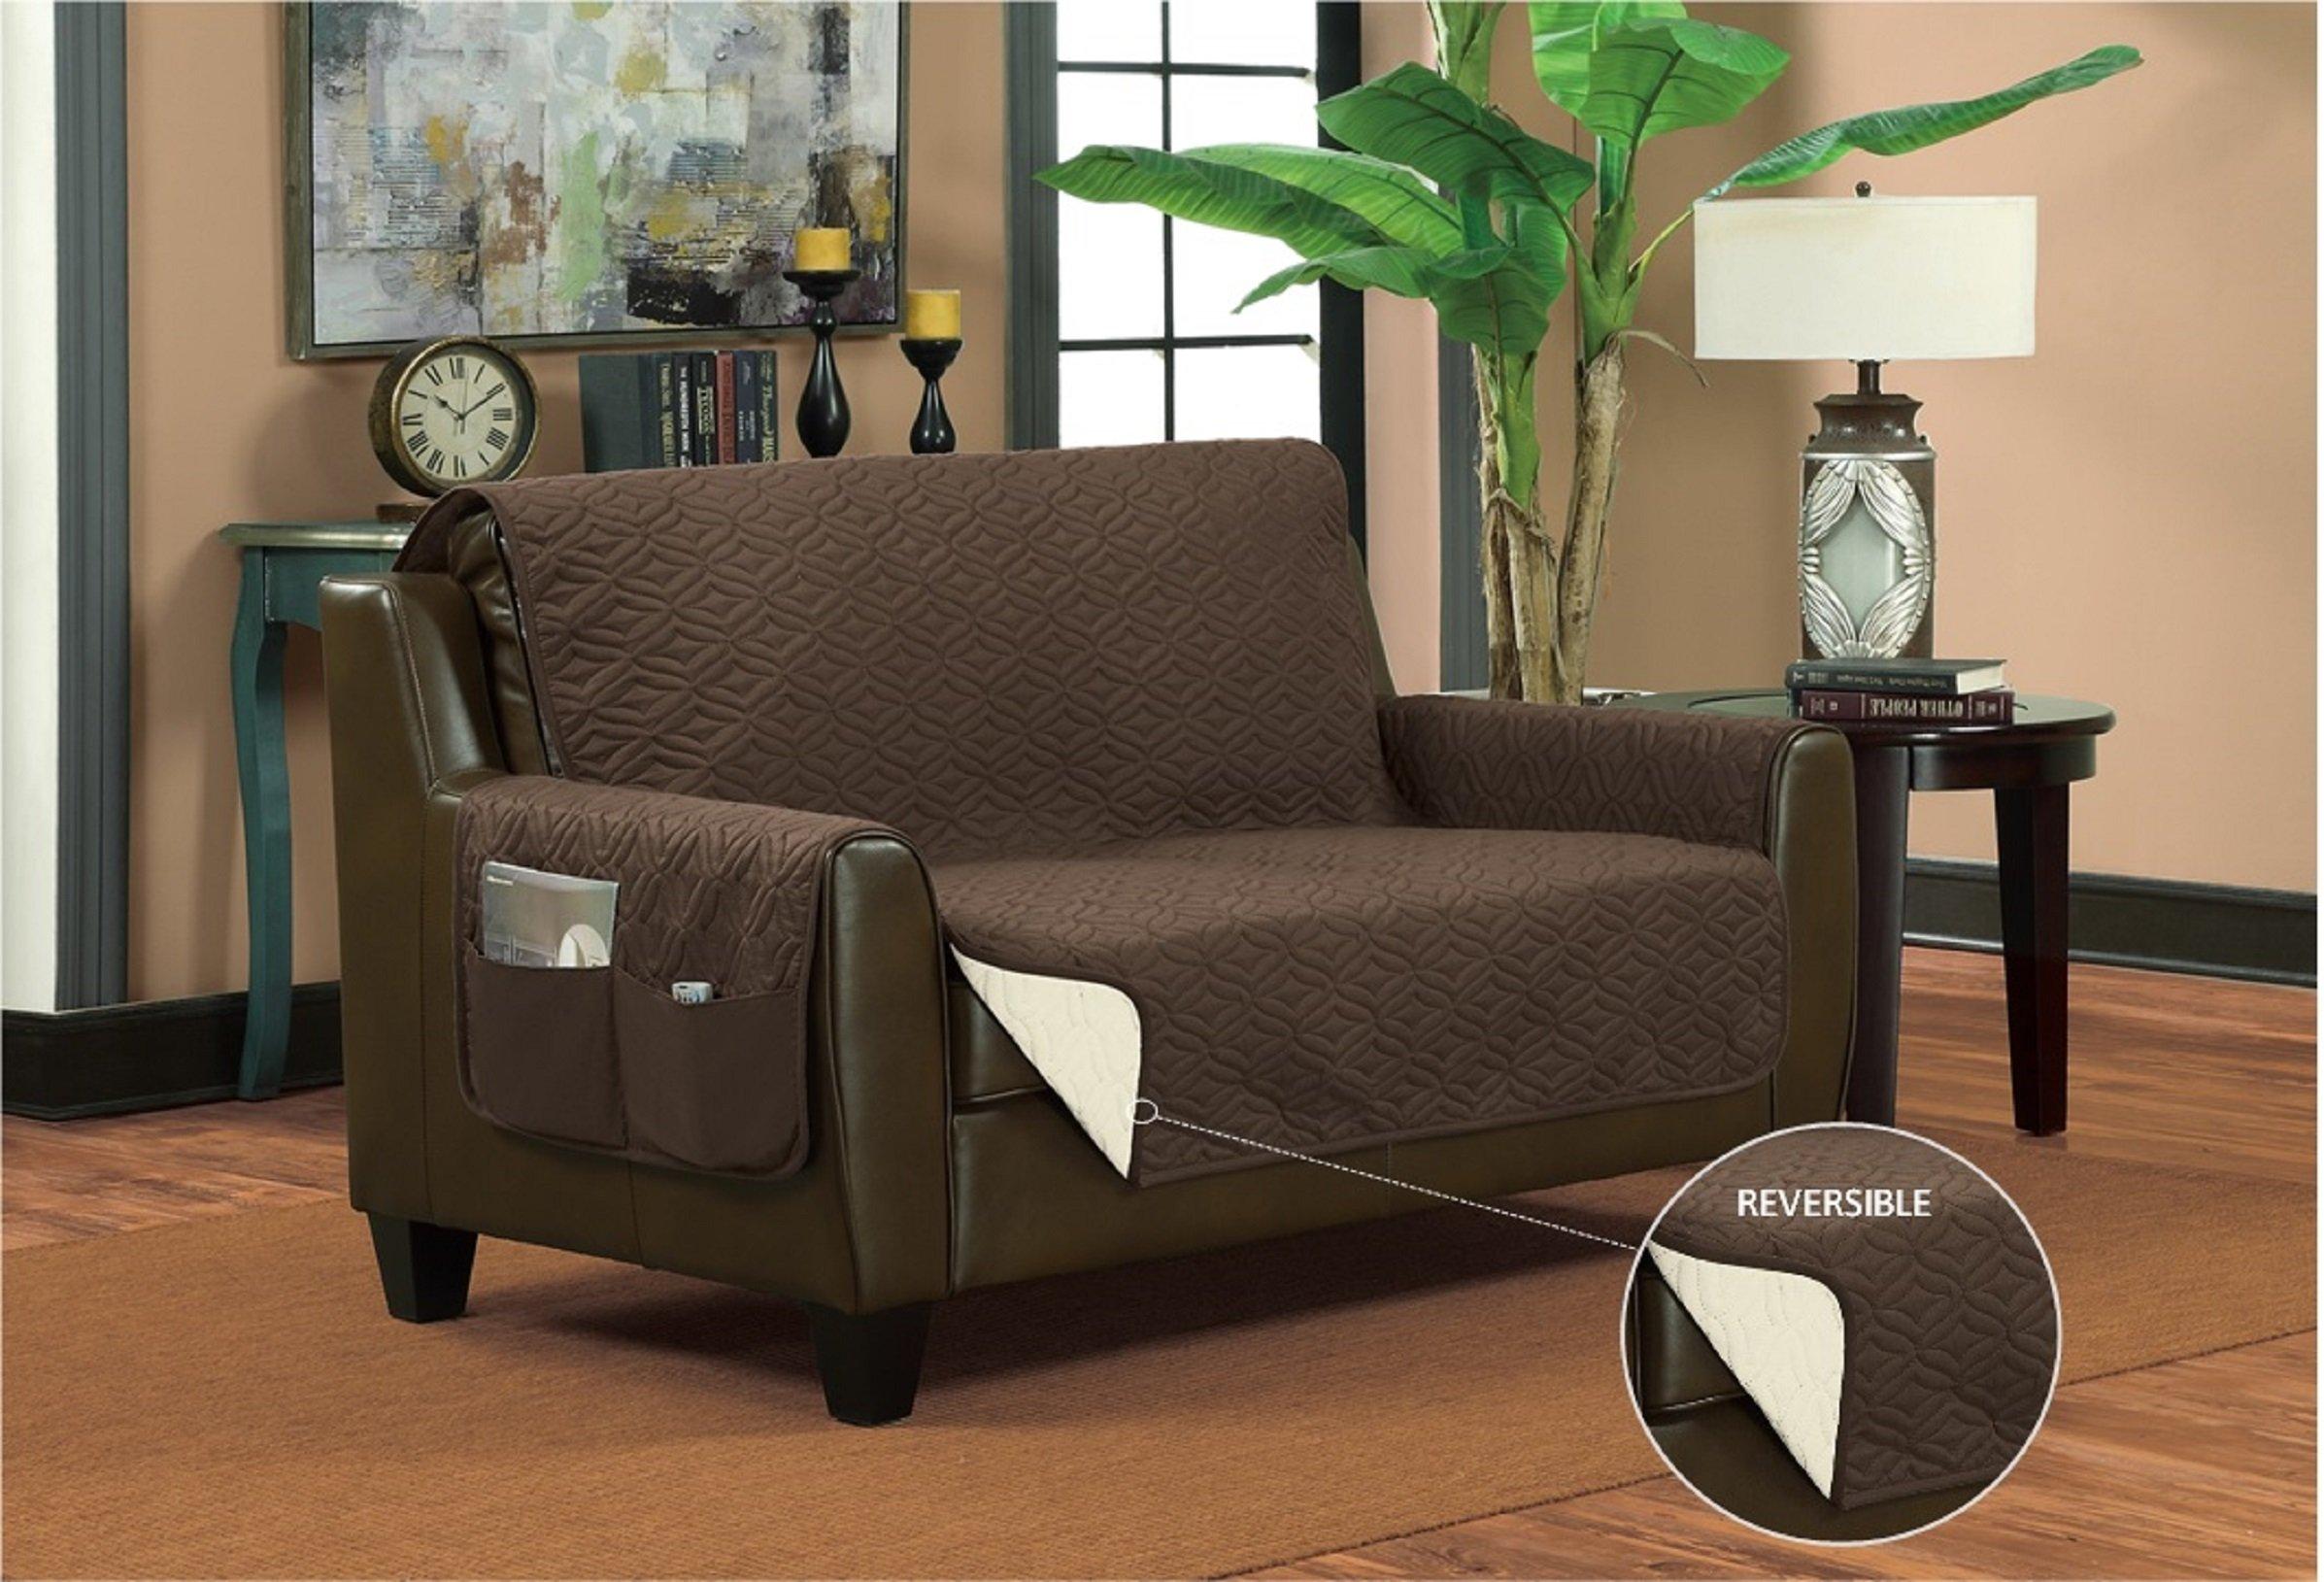 Bella Kline Reversible SOFA Furniture Protector, With 2 Storage Pockets - Mocha / Tan